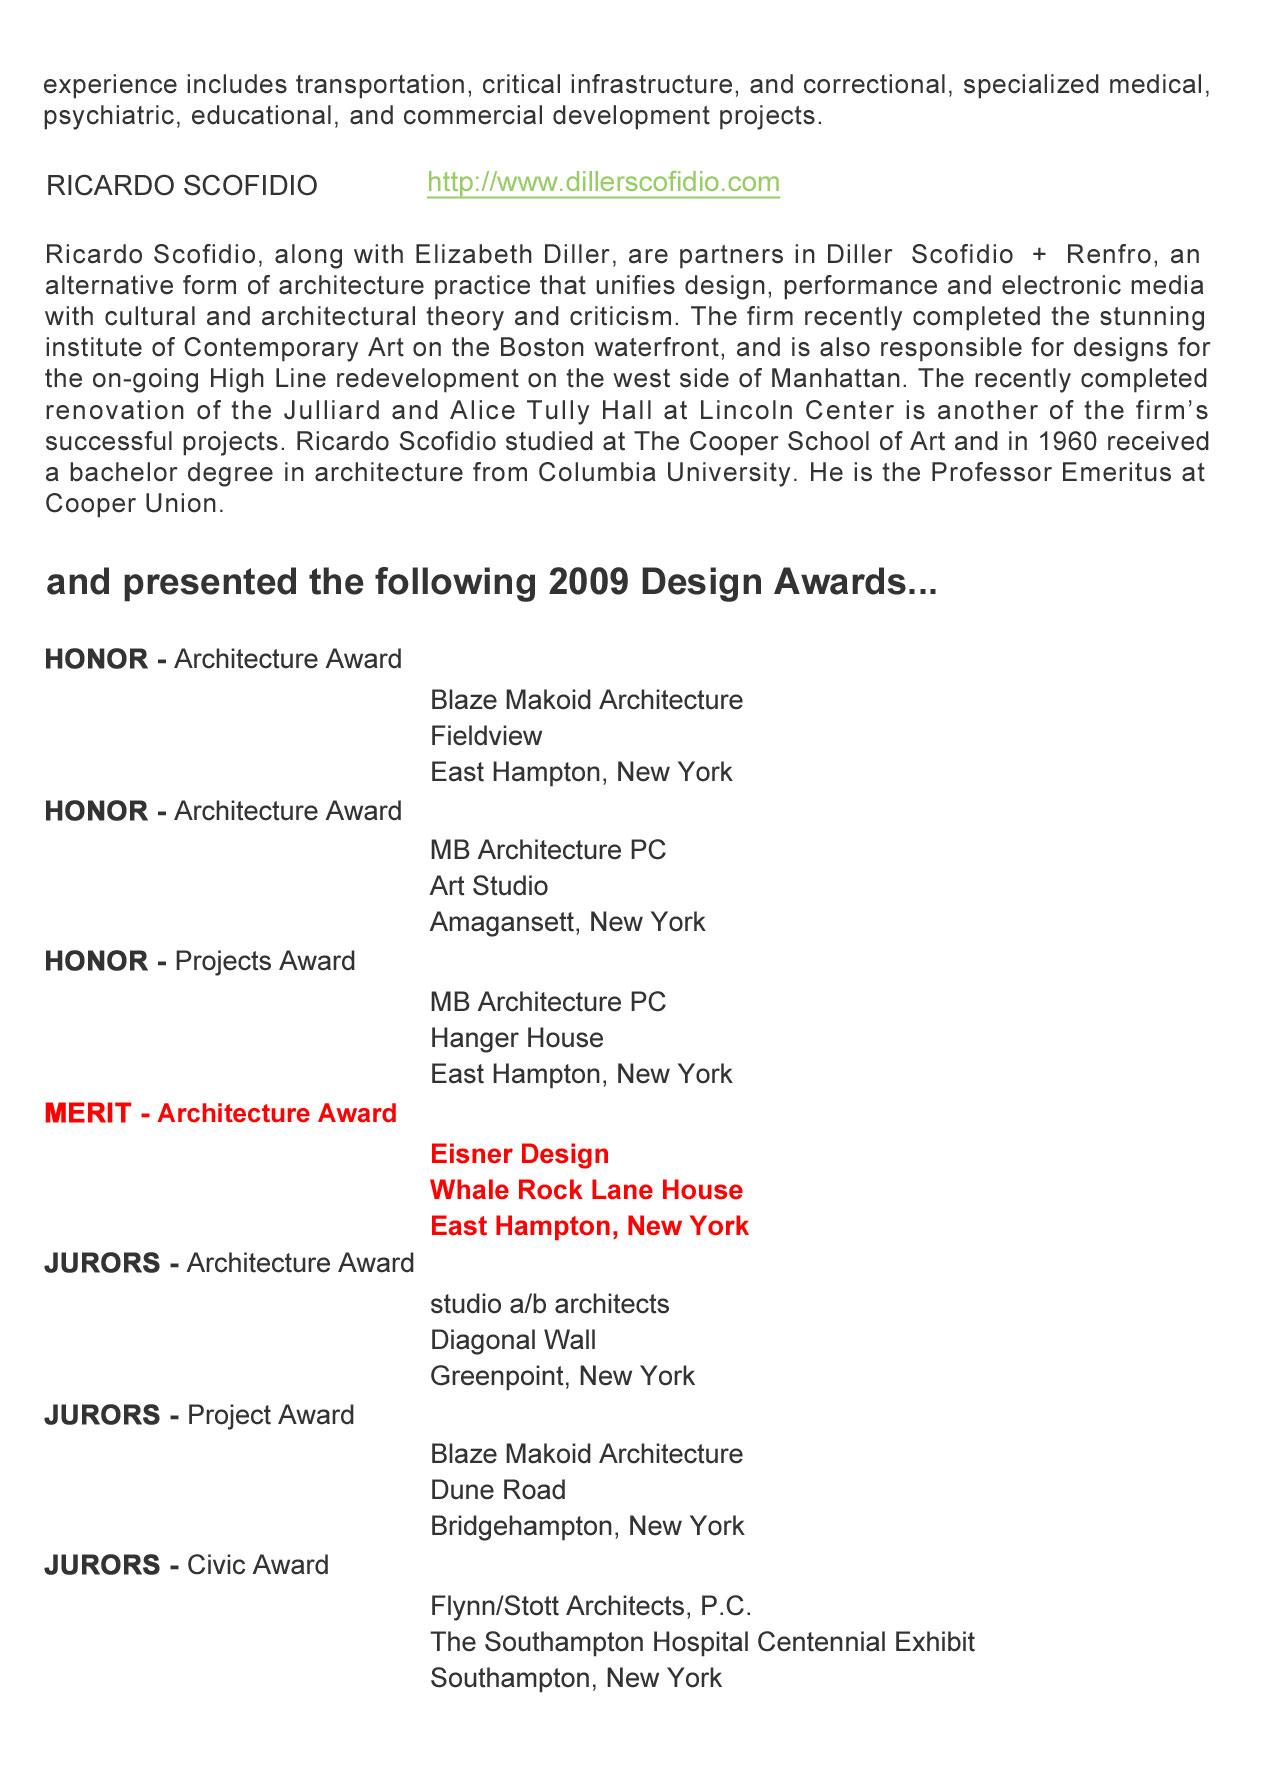 00_Awards_AIA-Peconic-Award-04_web_w1280